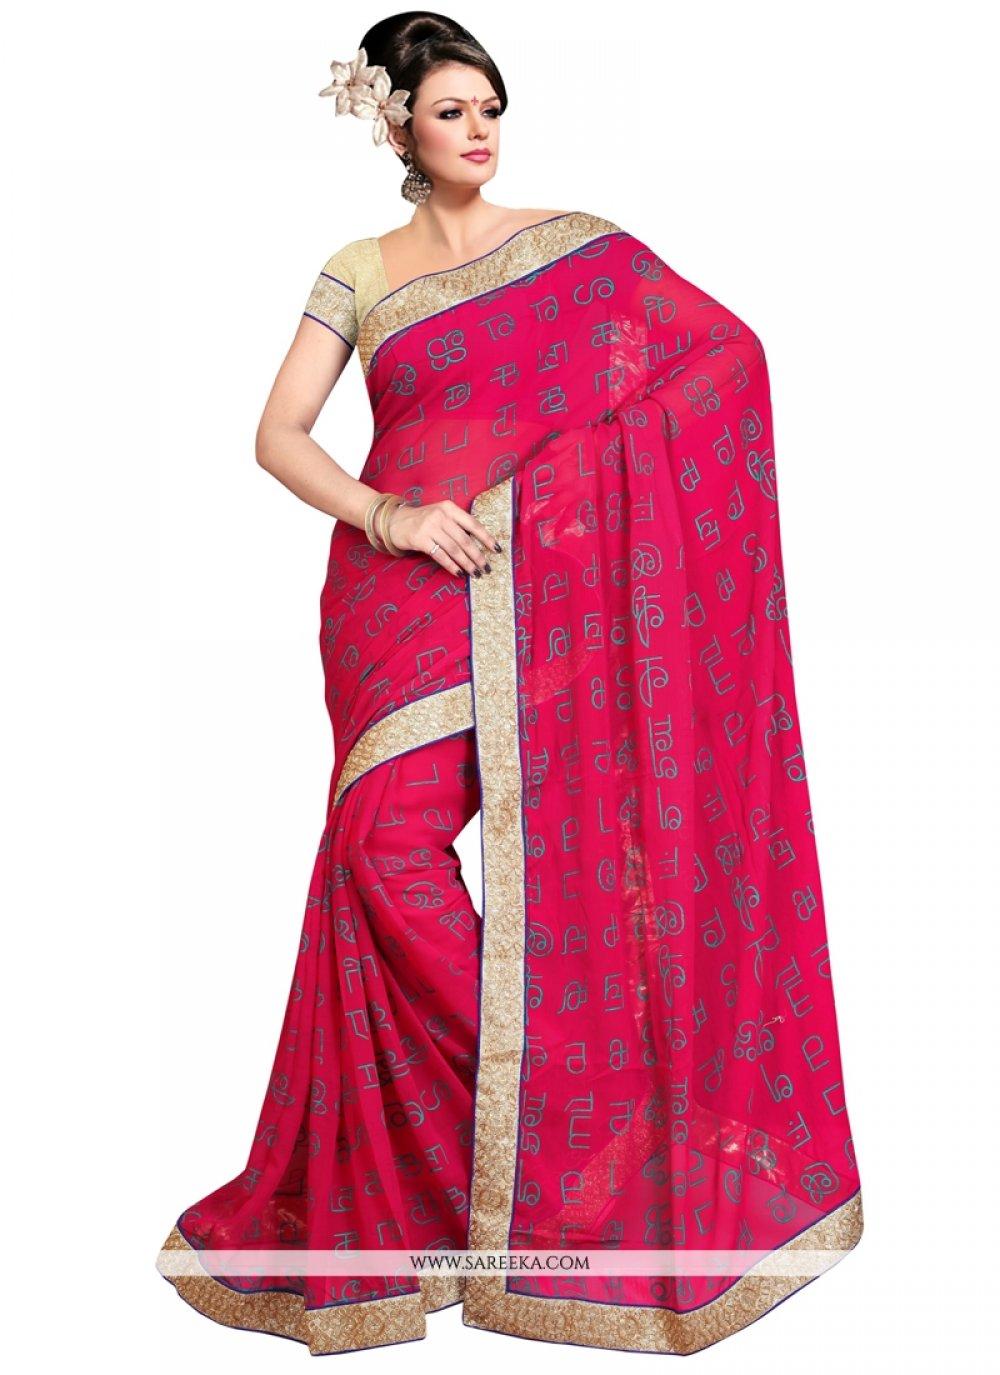 Hot Pink Patch Border Work Faux Chiffon Designer Saree